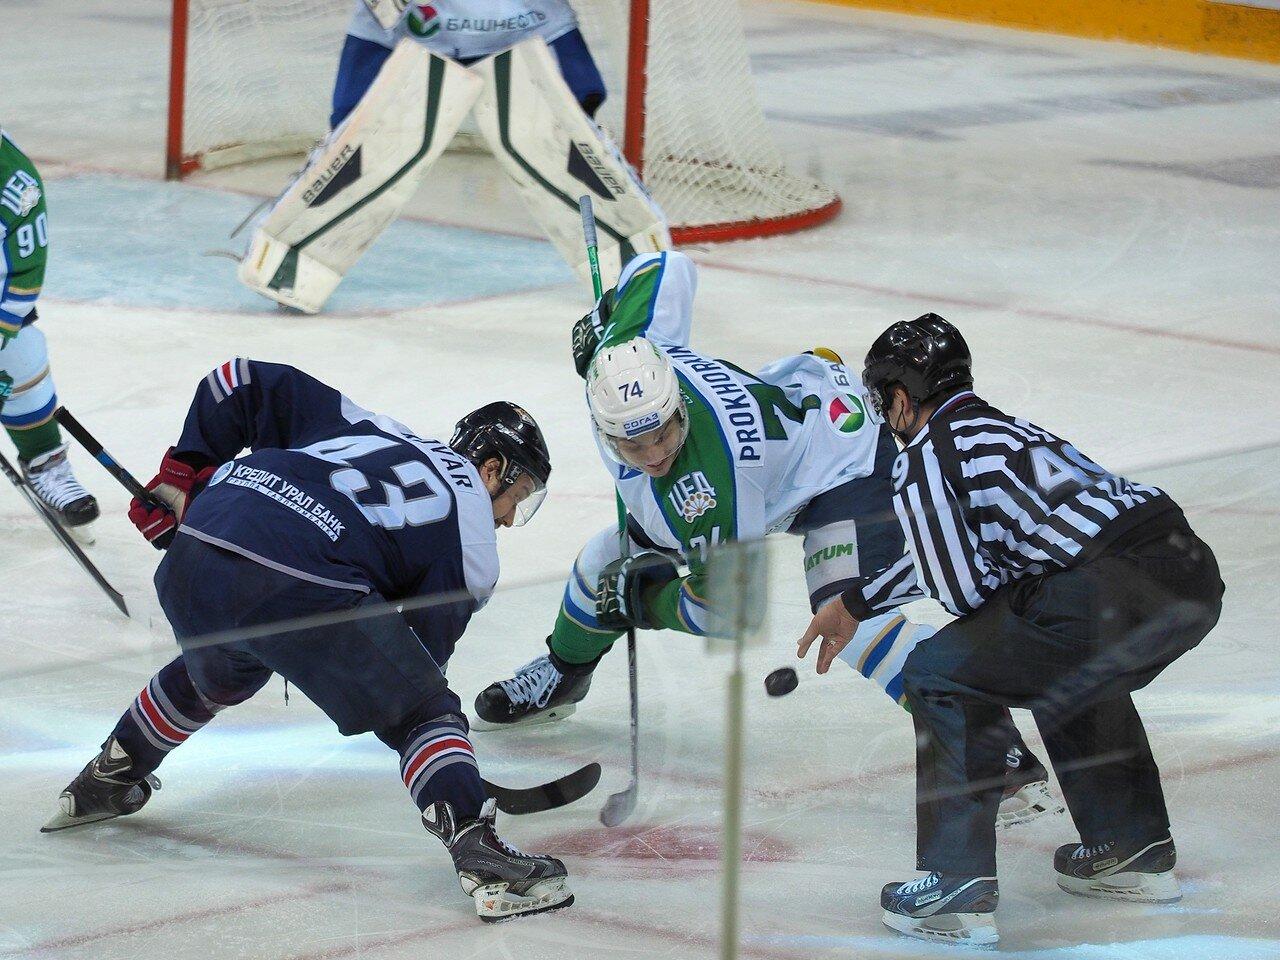 83Плей-офф 2016 Восток Финал Металлург - Салават Юлаев 31.03.2016